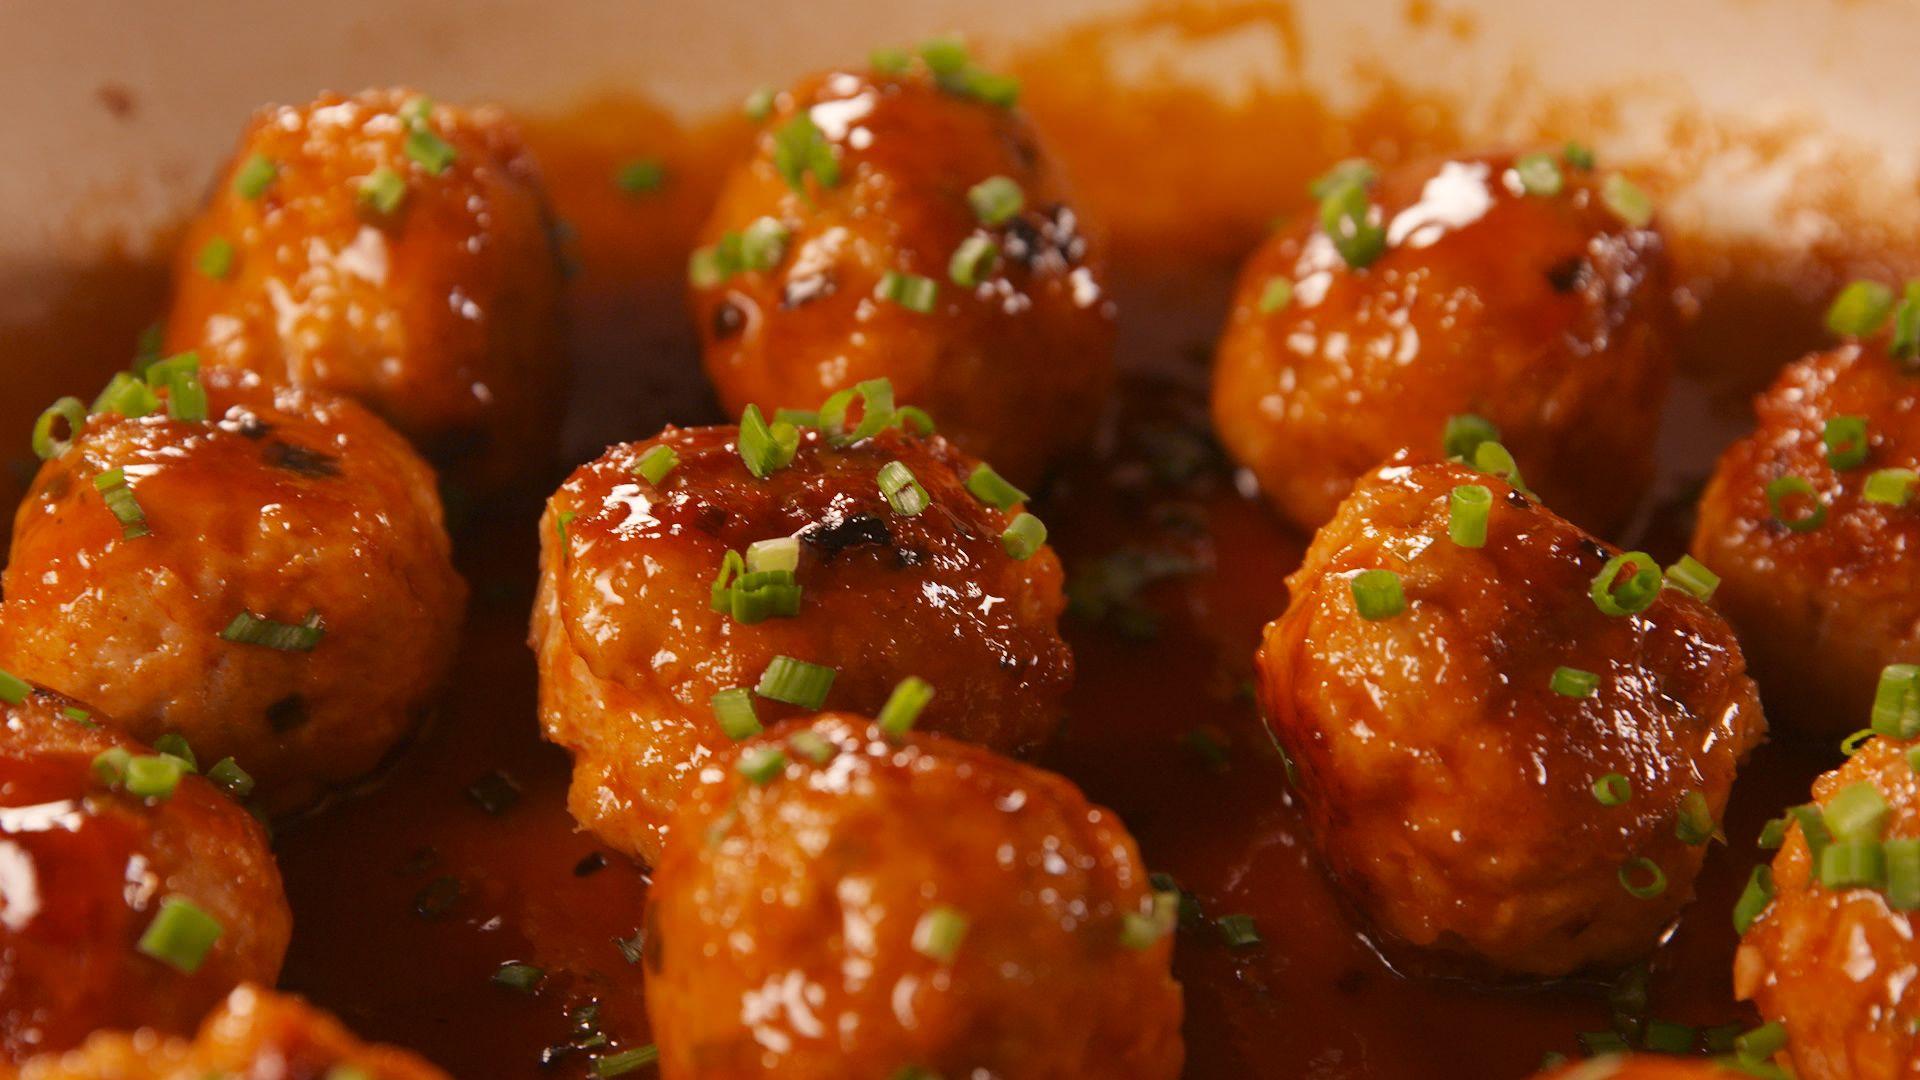 Best Firecracker Chicken Meatballs Recipe How To Make Firecracker Chicken Meatballs Recipe How To Make Firecracker Chicken Meatballs